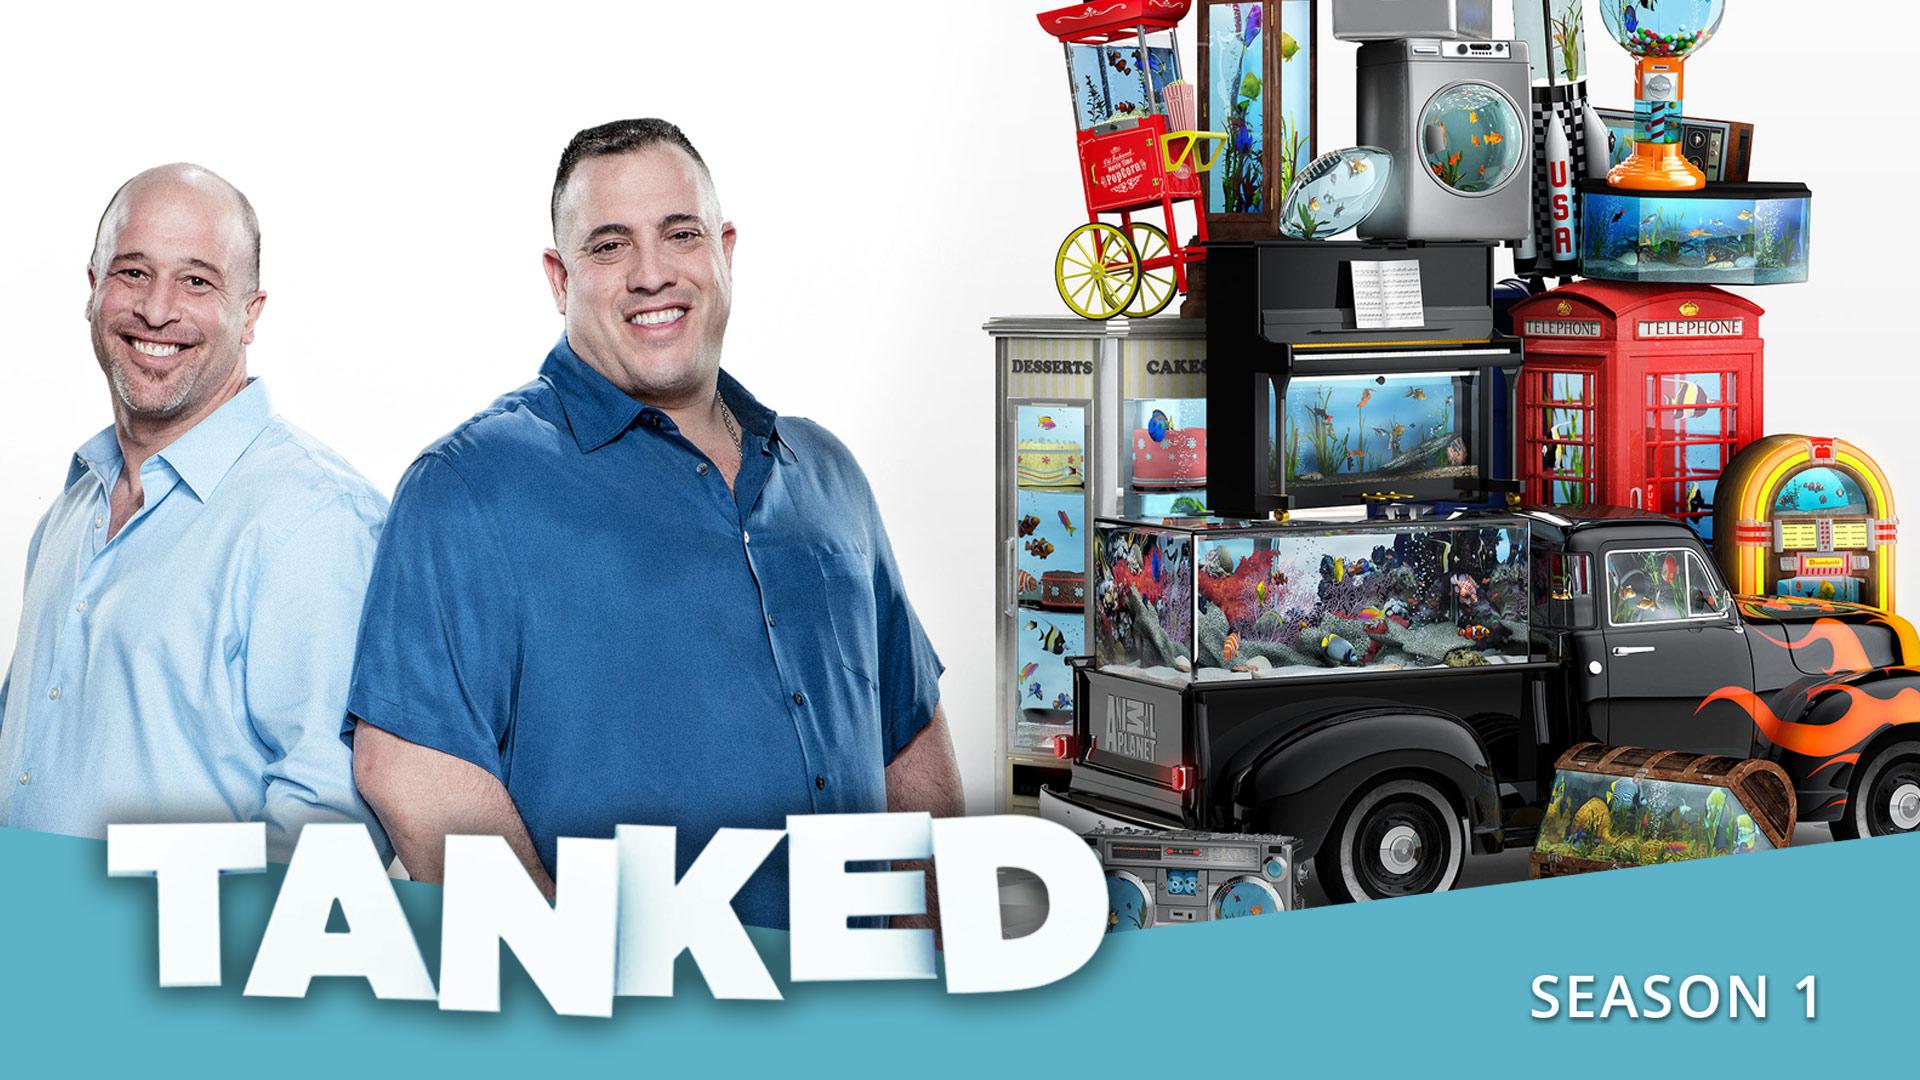 Tanked - Season 1